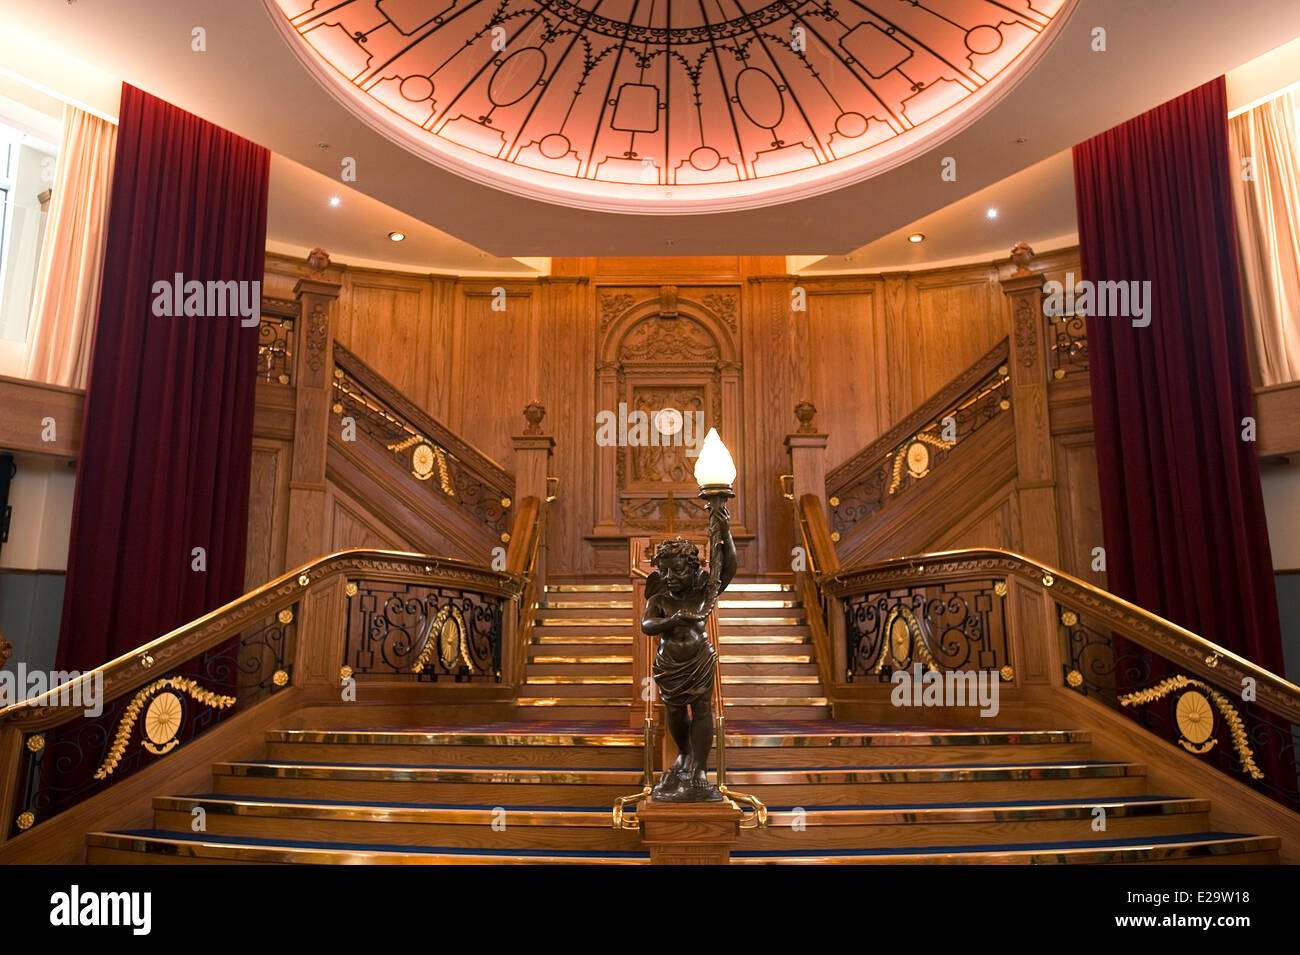 Großbritannien, Nordirland, Belfast, Belfast Titanic-Museum, die berühmte Treppe Stockbild